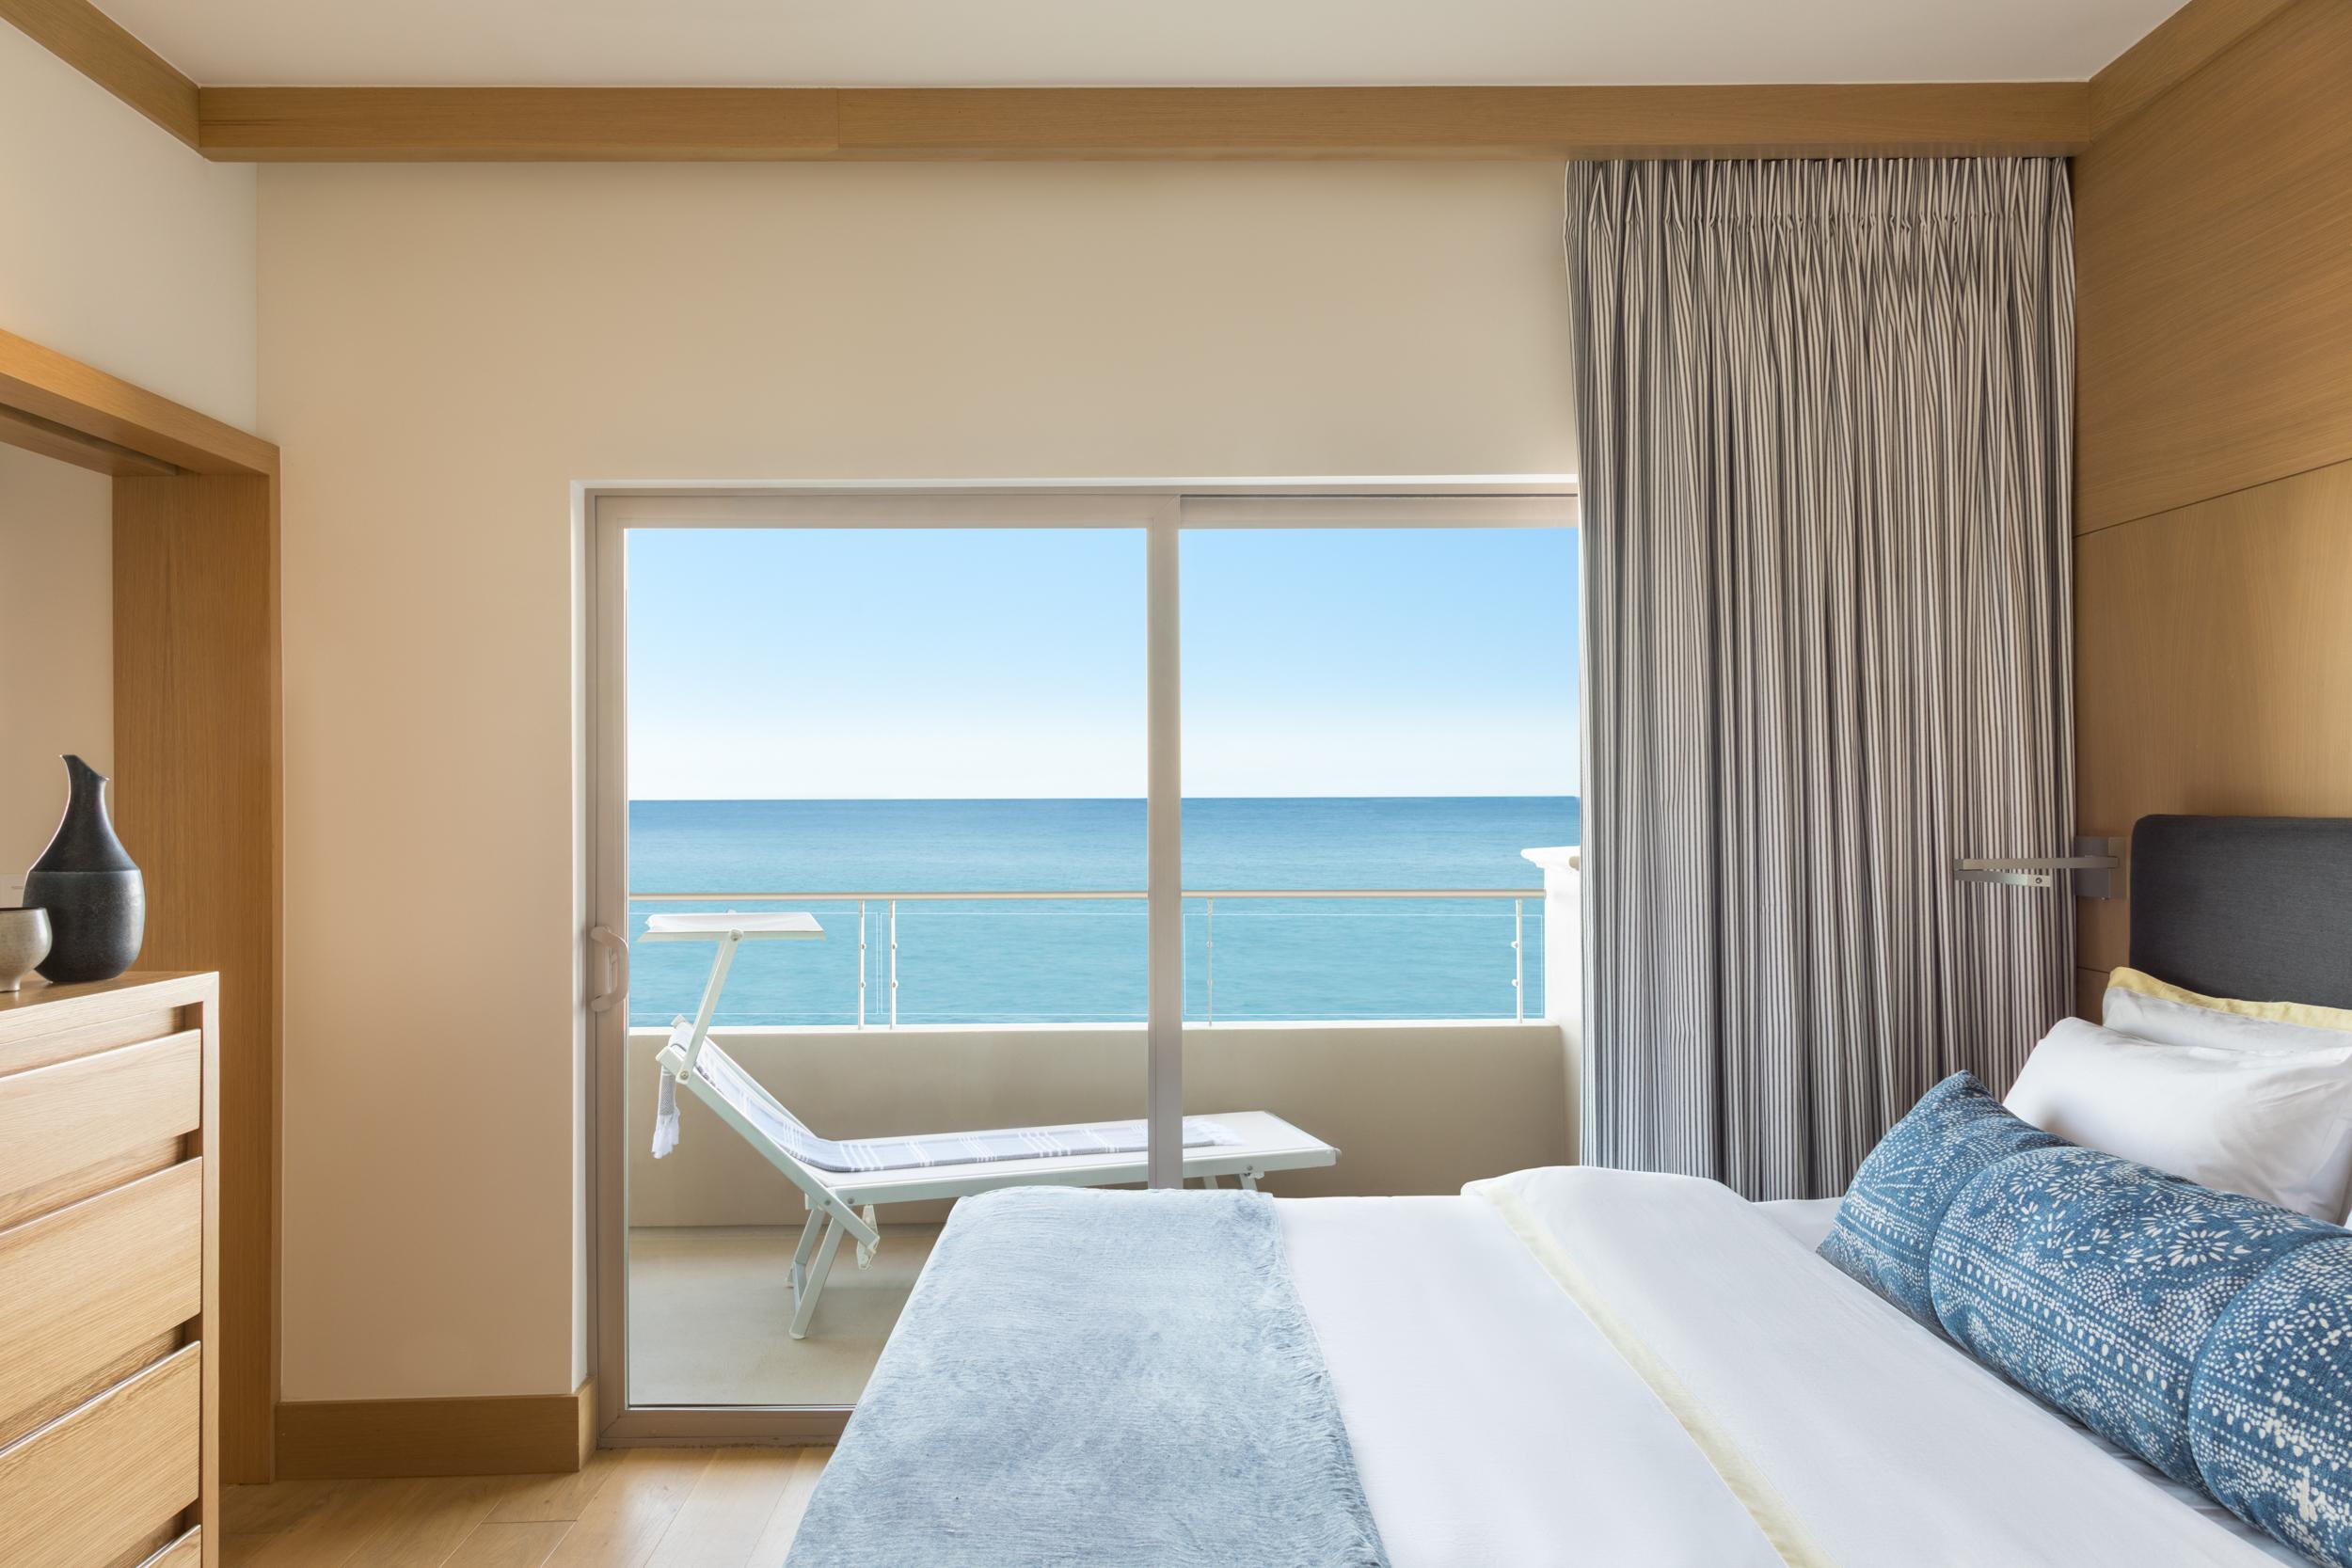 Malibu Hotel - Luxury Beach Resort | Malibu Beach Inn